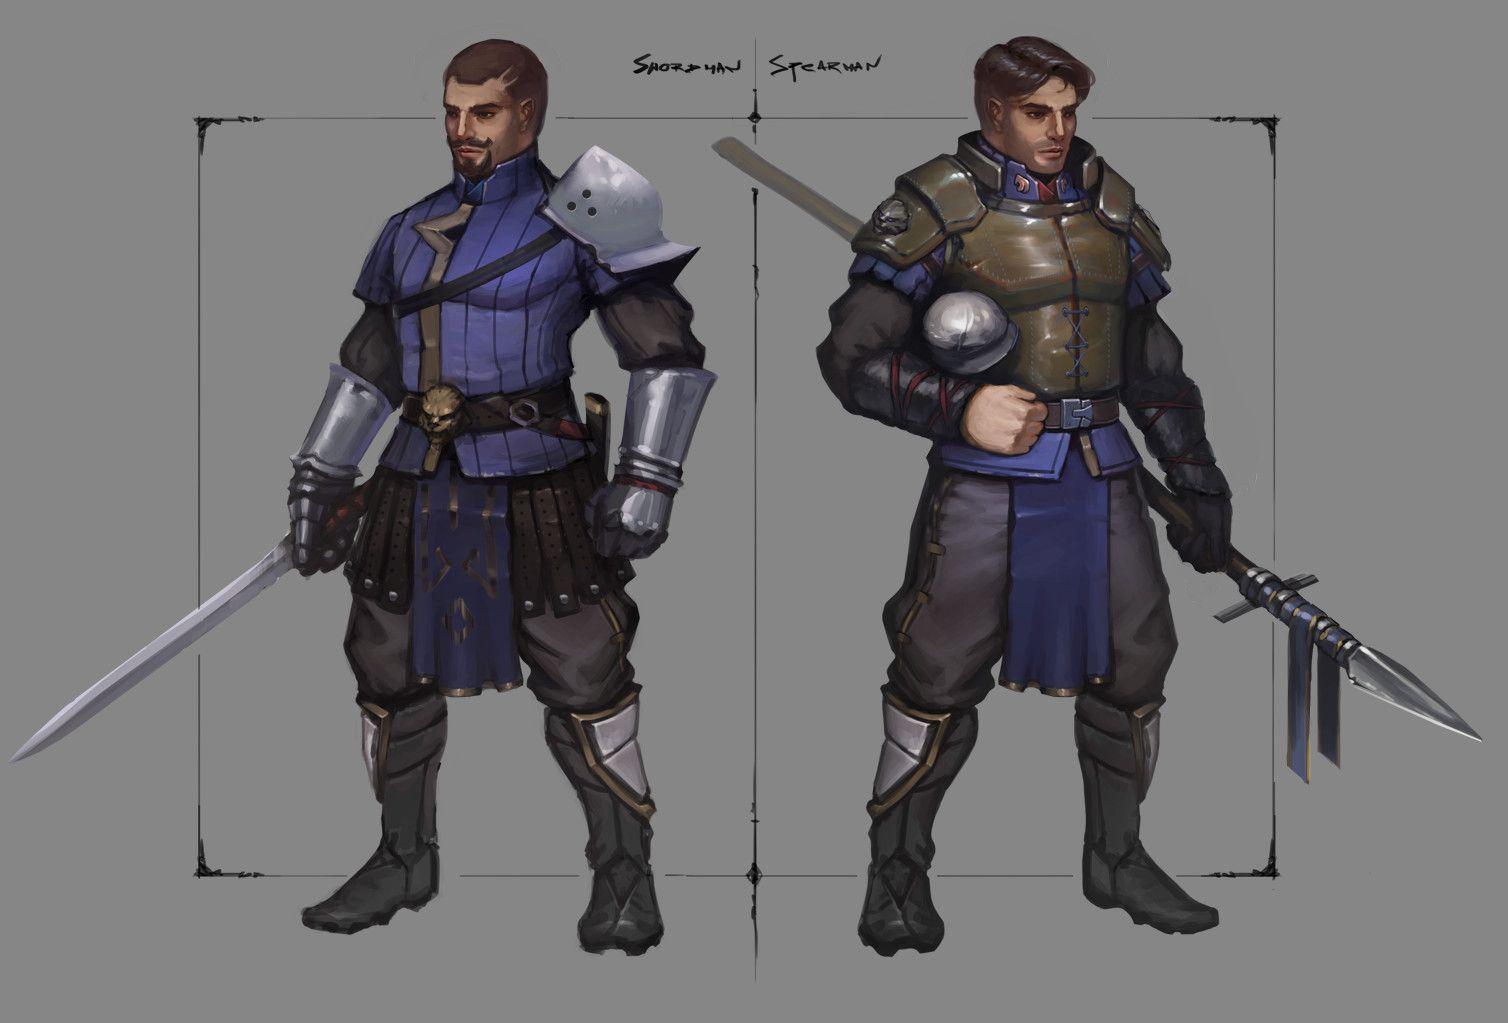 Swordman/Spearman, Wojtek Kołaciński on ArtStation at https://www.artstation.com/artwork/xB2lW